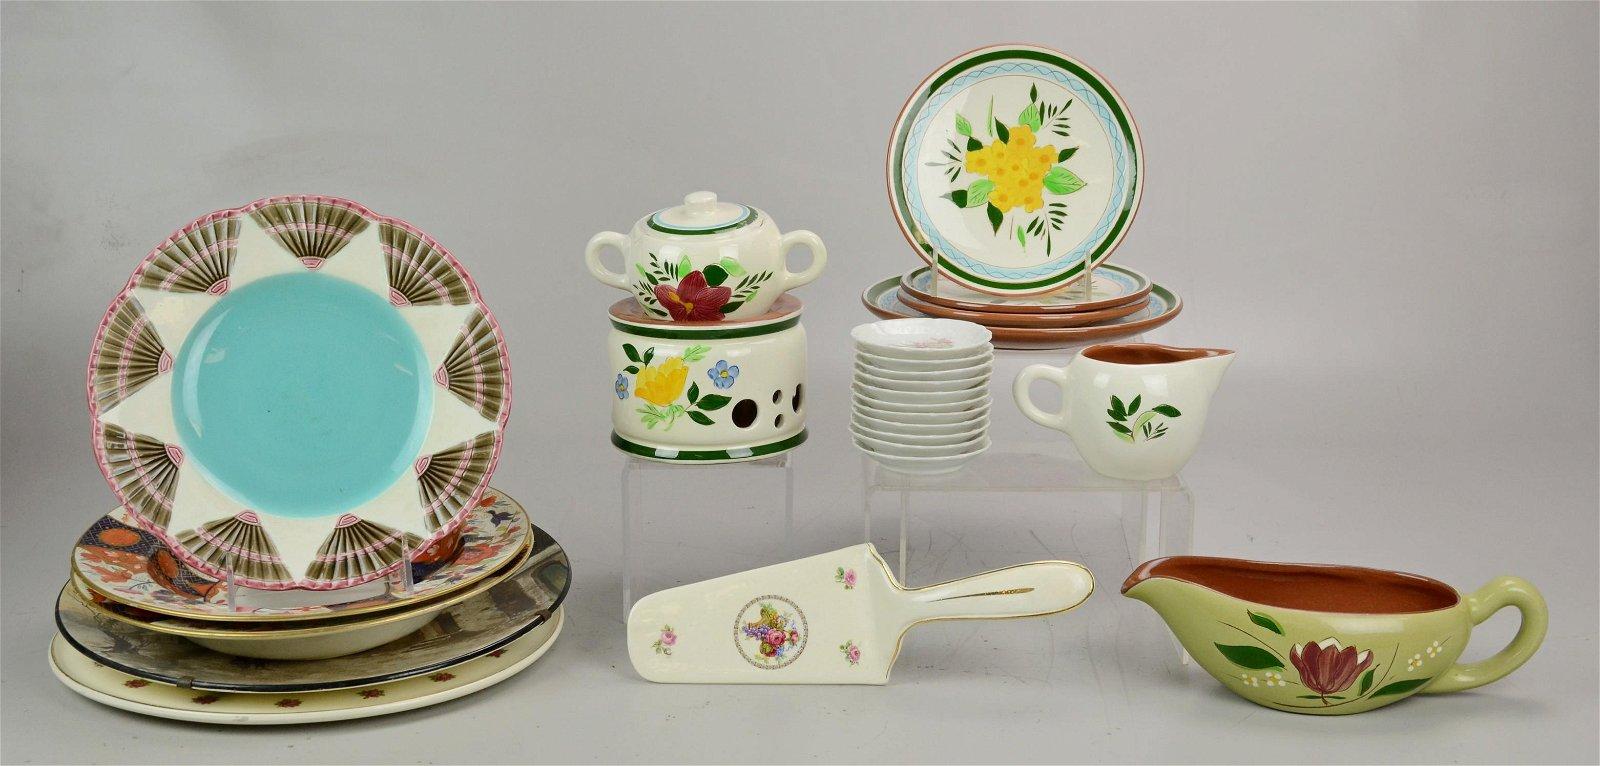 Lot of Porcelain & Pottery